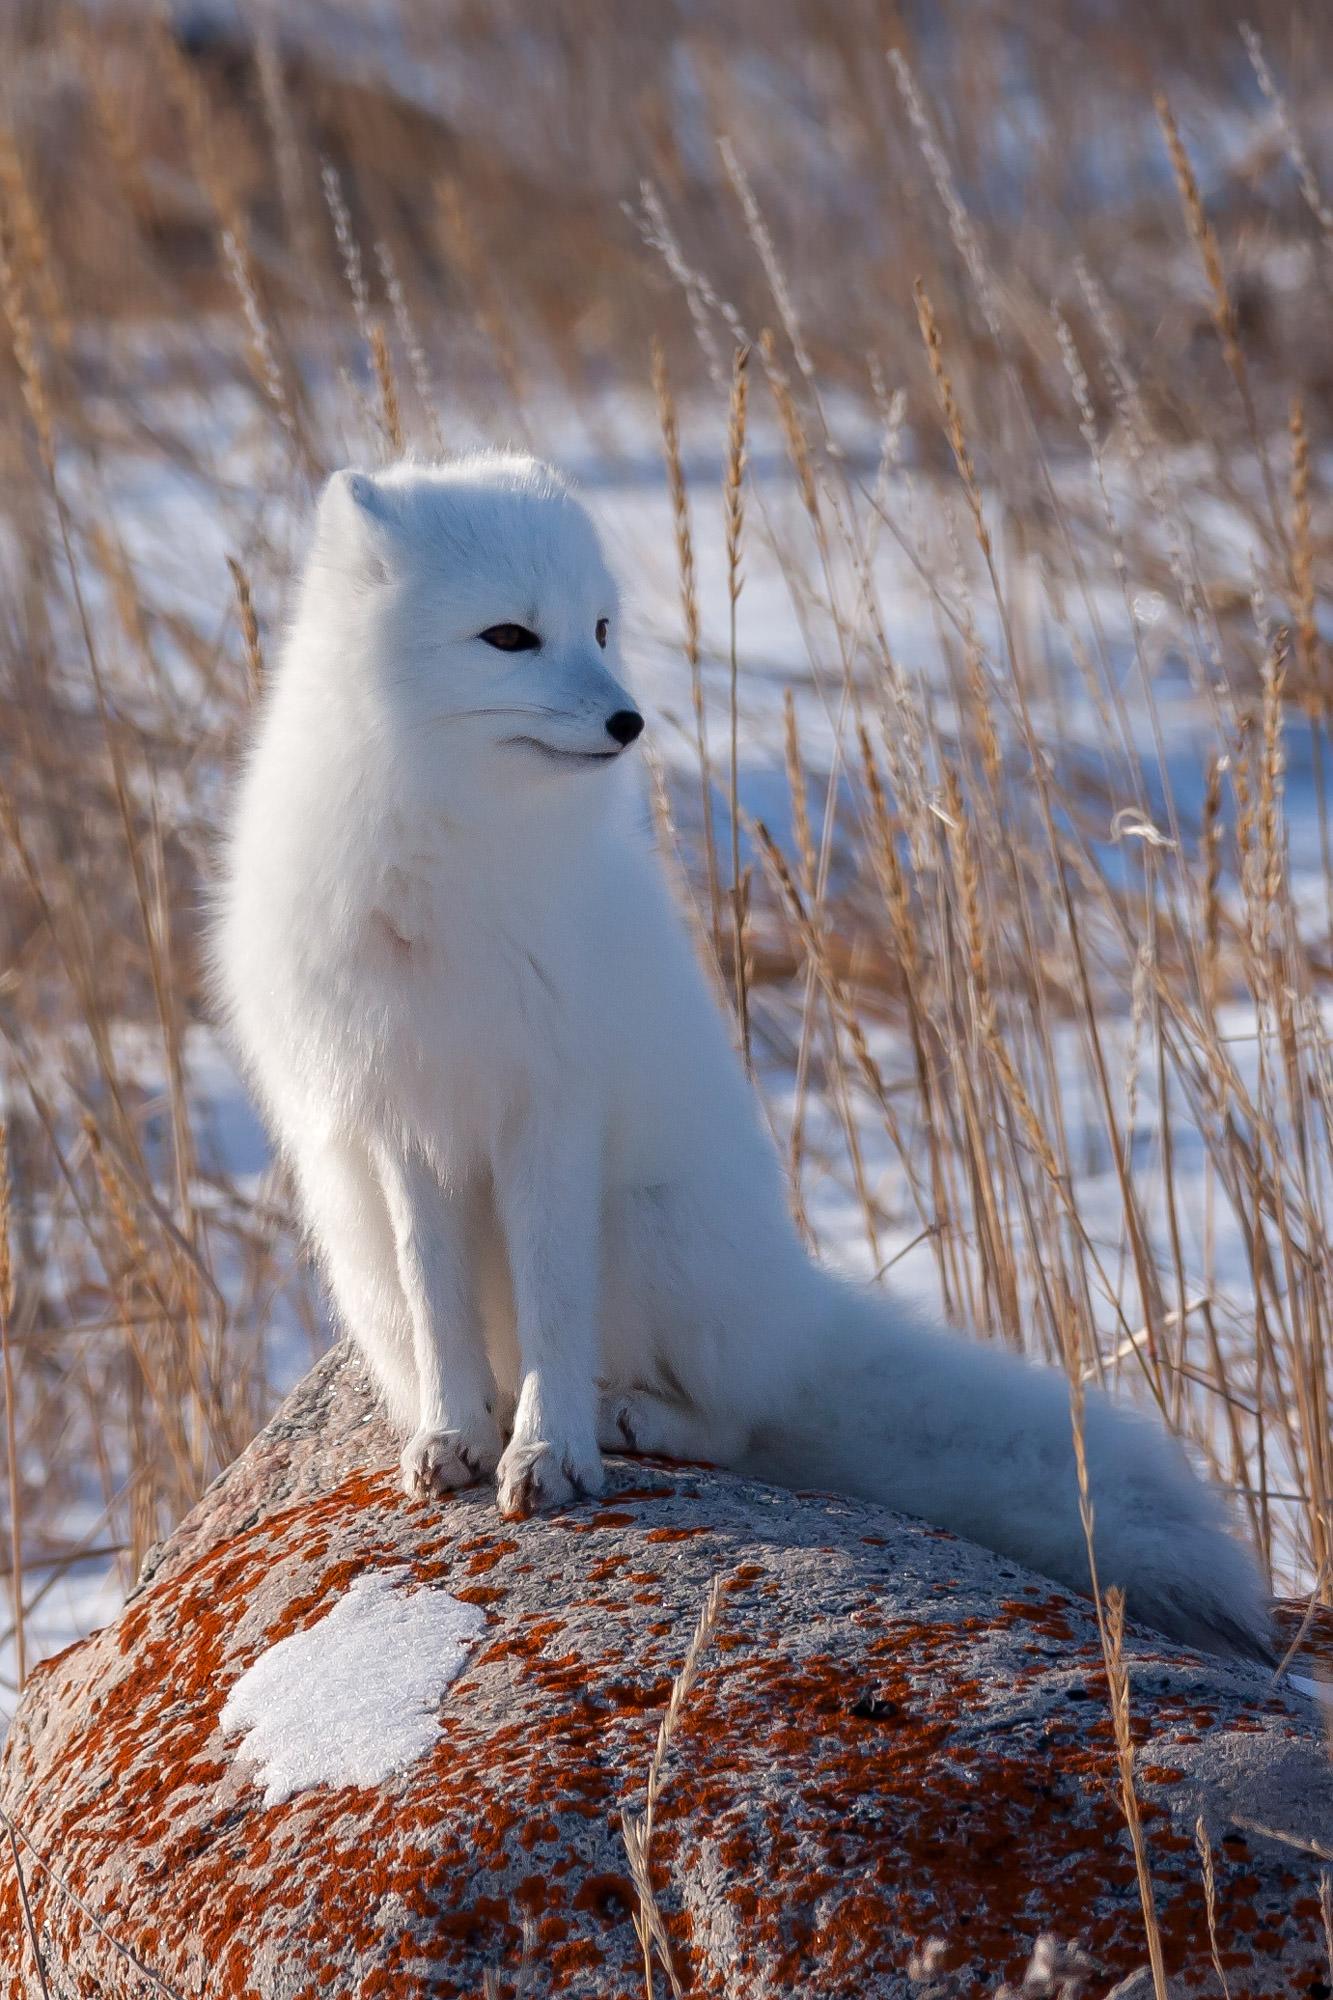 Fox, Arctic Fox, Canada, Winter, limited edition, photograph, fine art, wildlife, photo